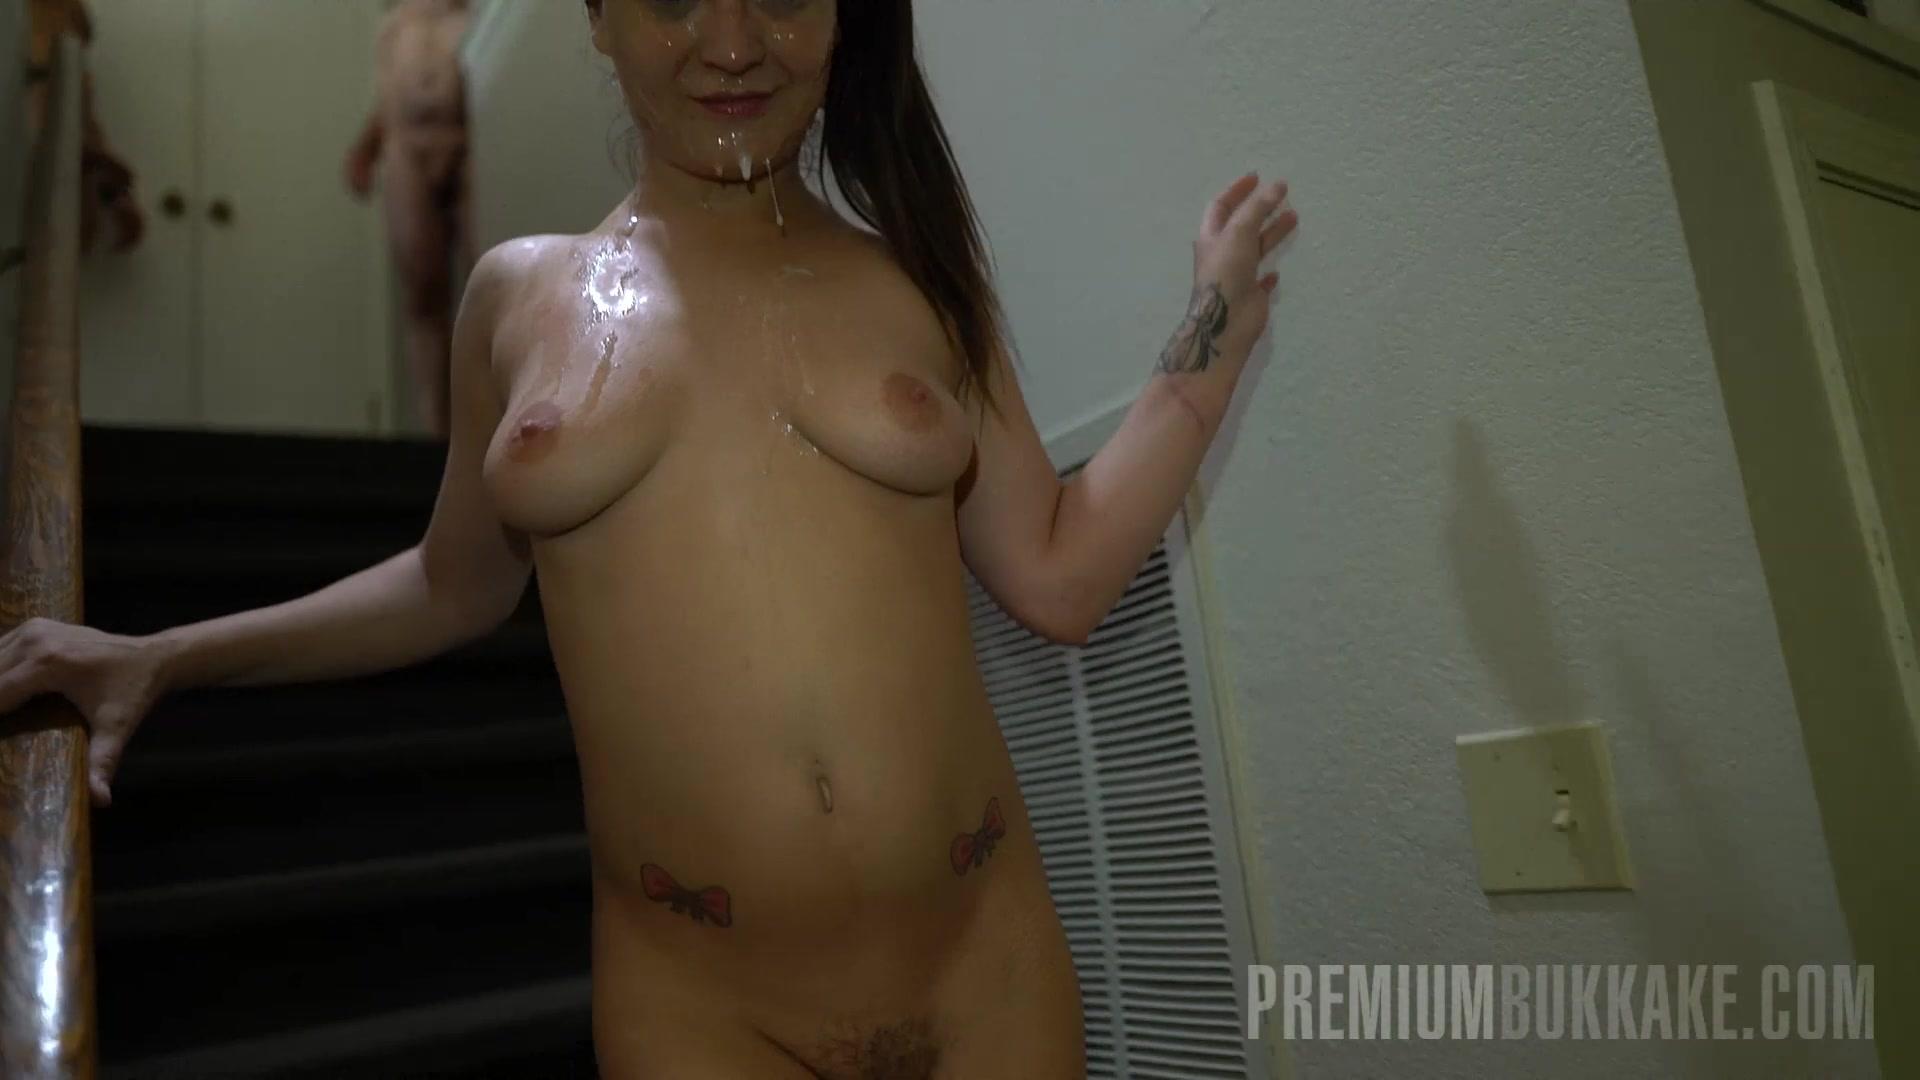 Avril lavigne pussy naked